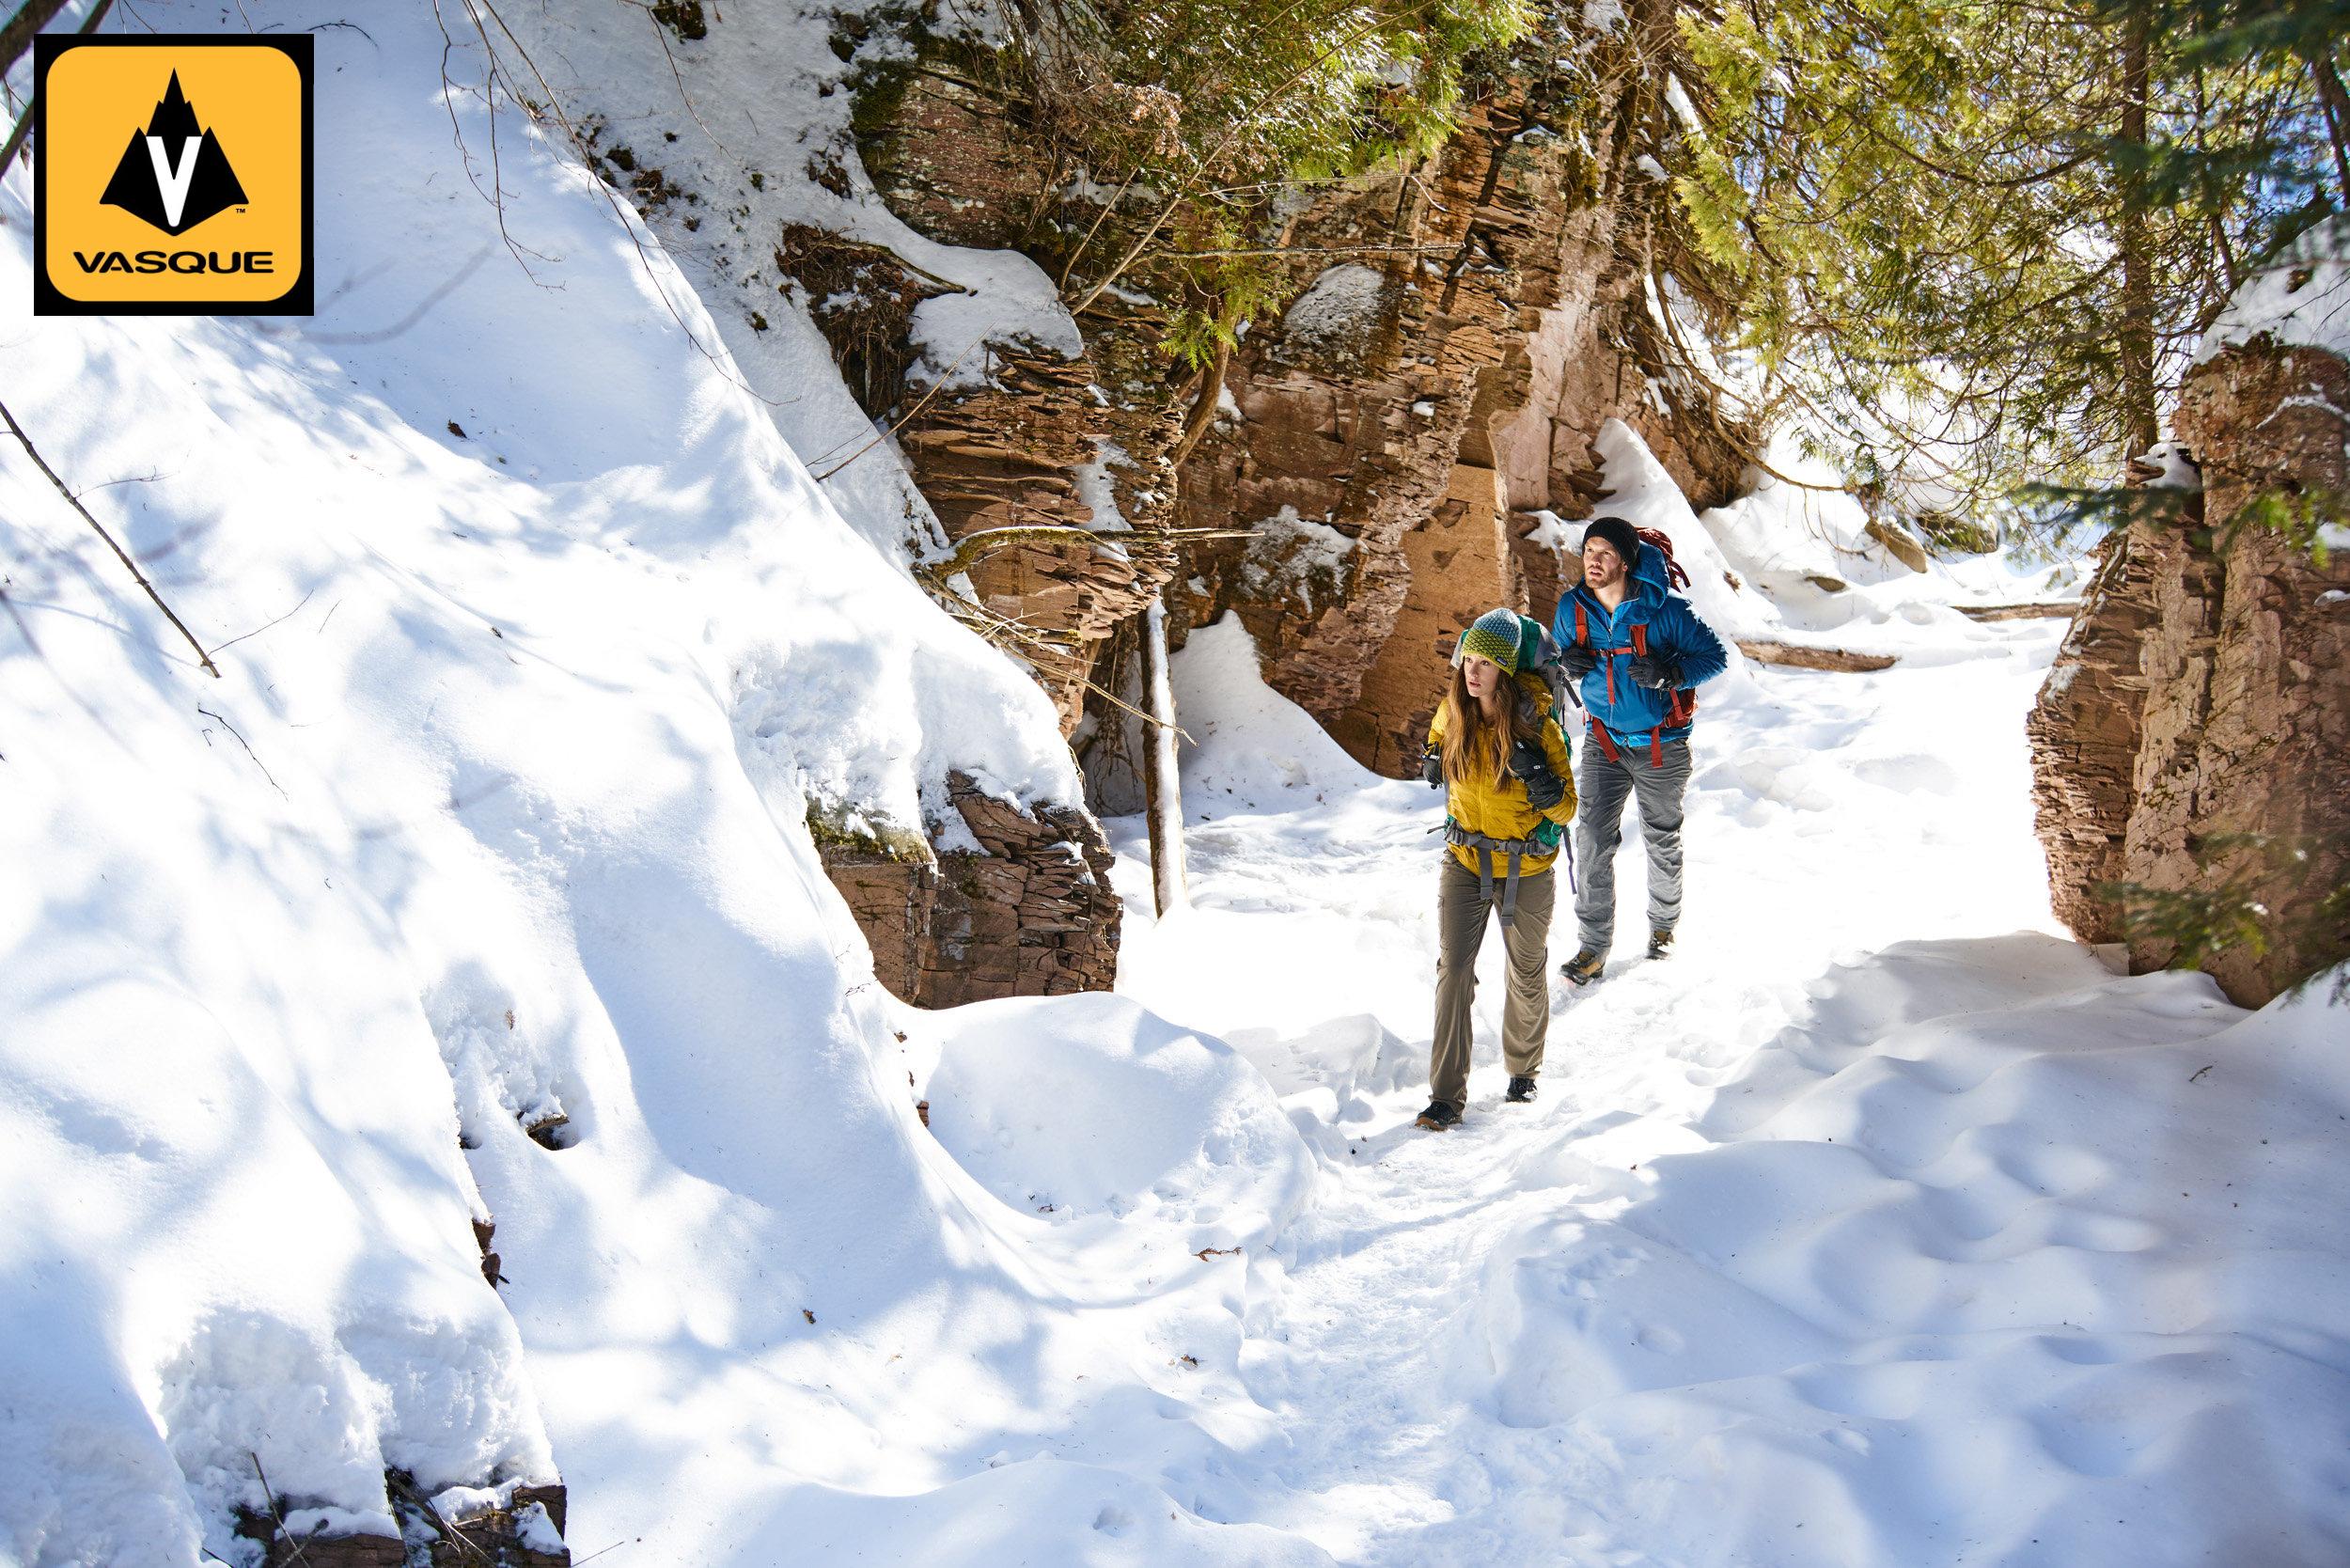 Vasque Presents Winter Hiking Tips